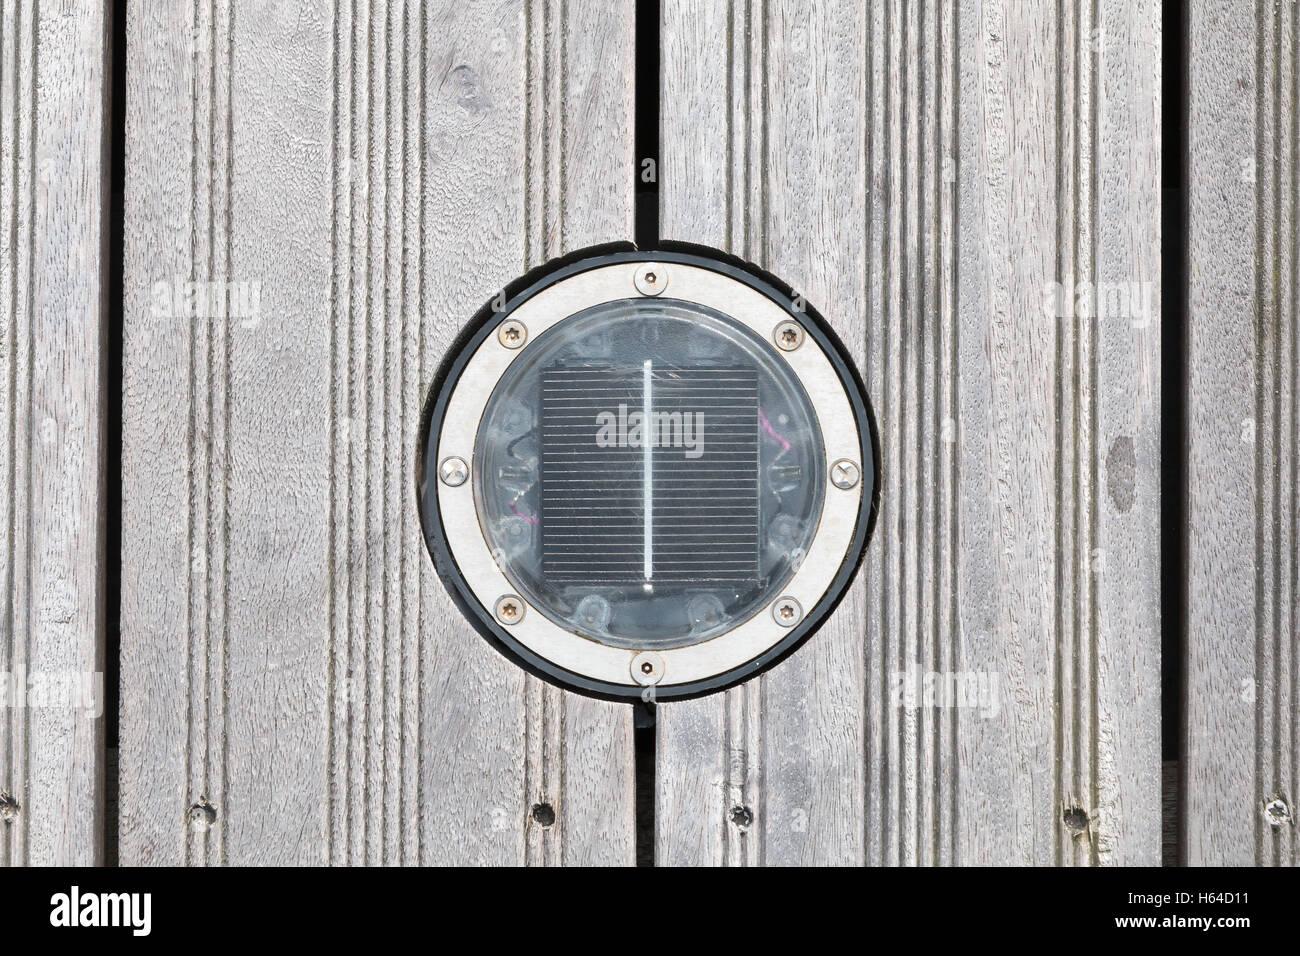 Solar Round Deck light LED on a wooden bridge - Stock Image